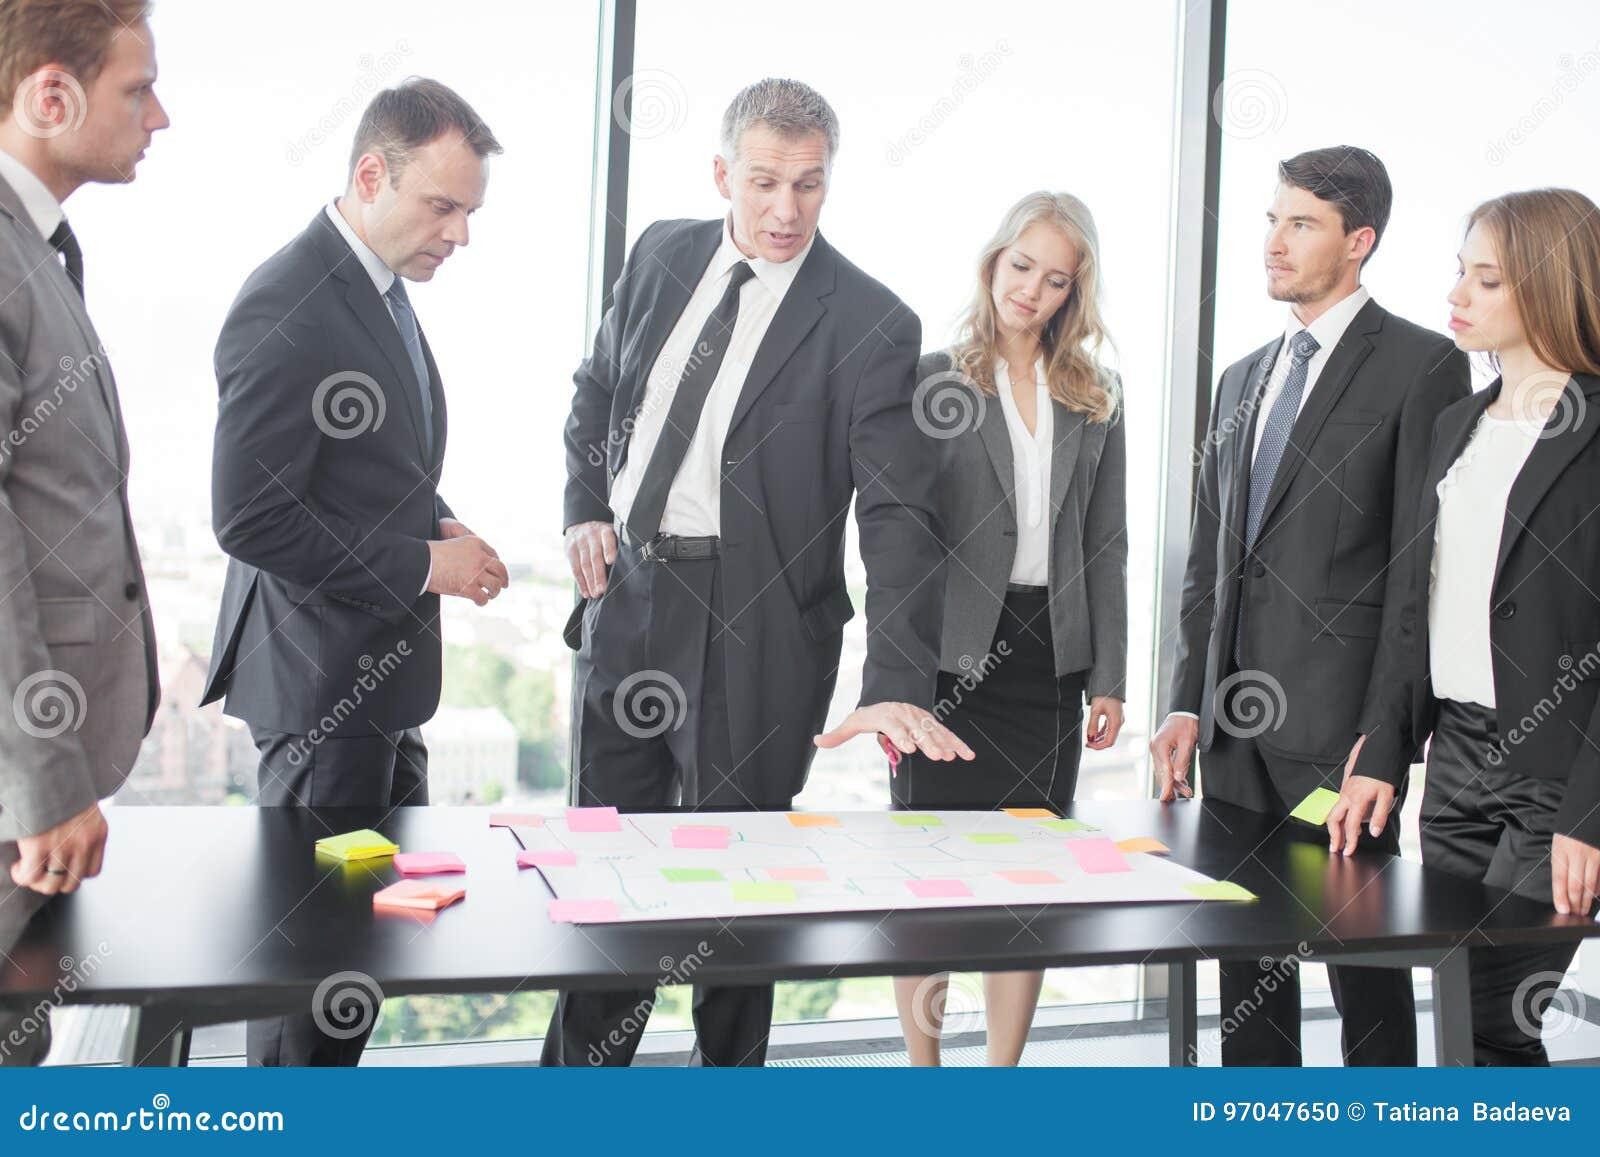 Business people developing plan on office desk